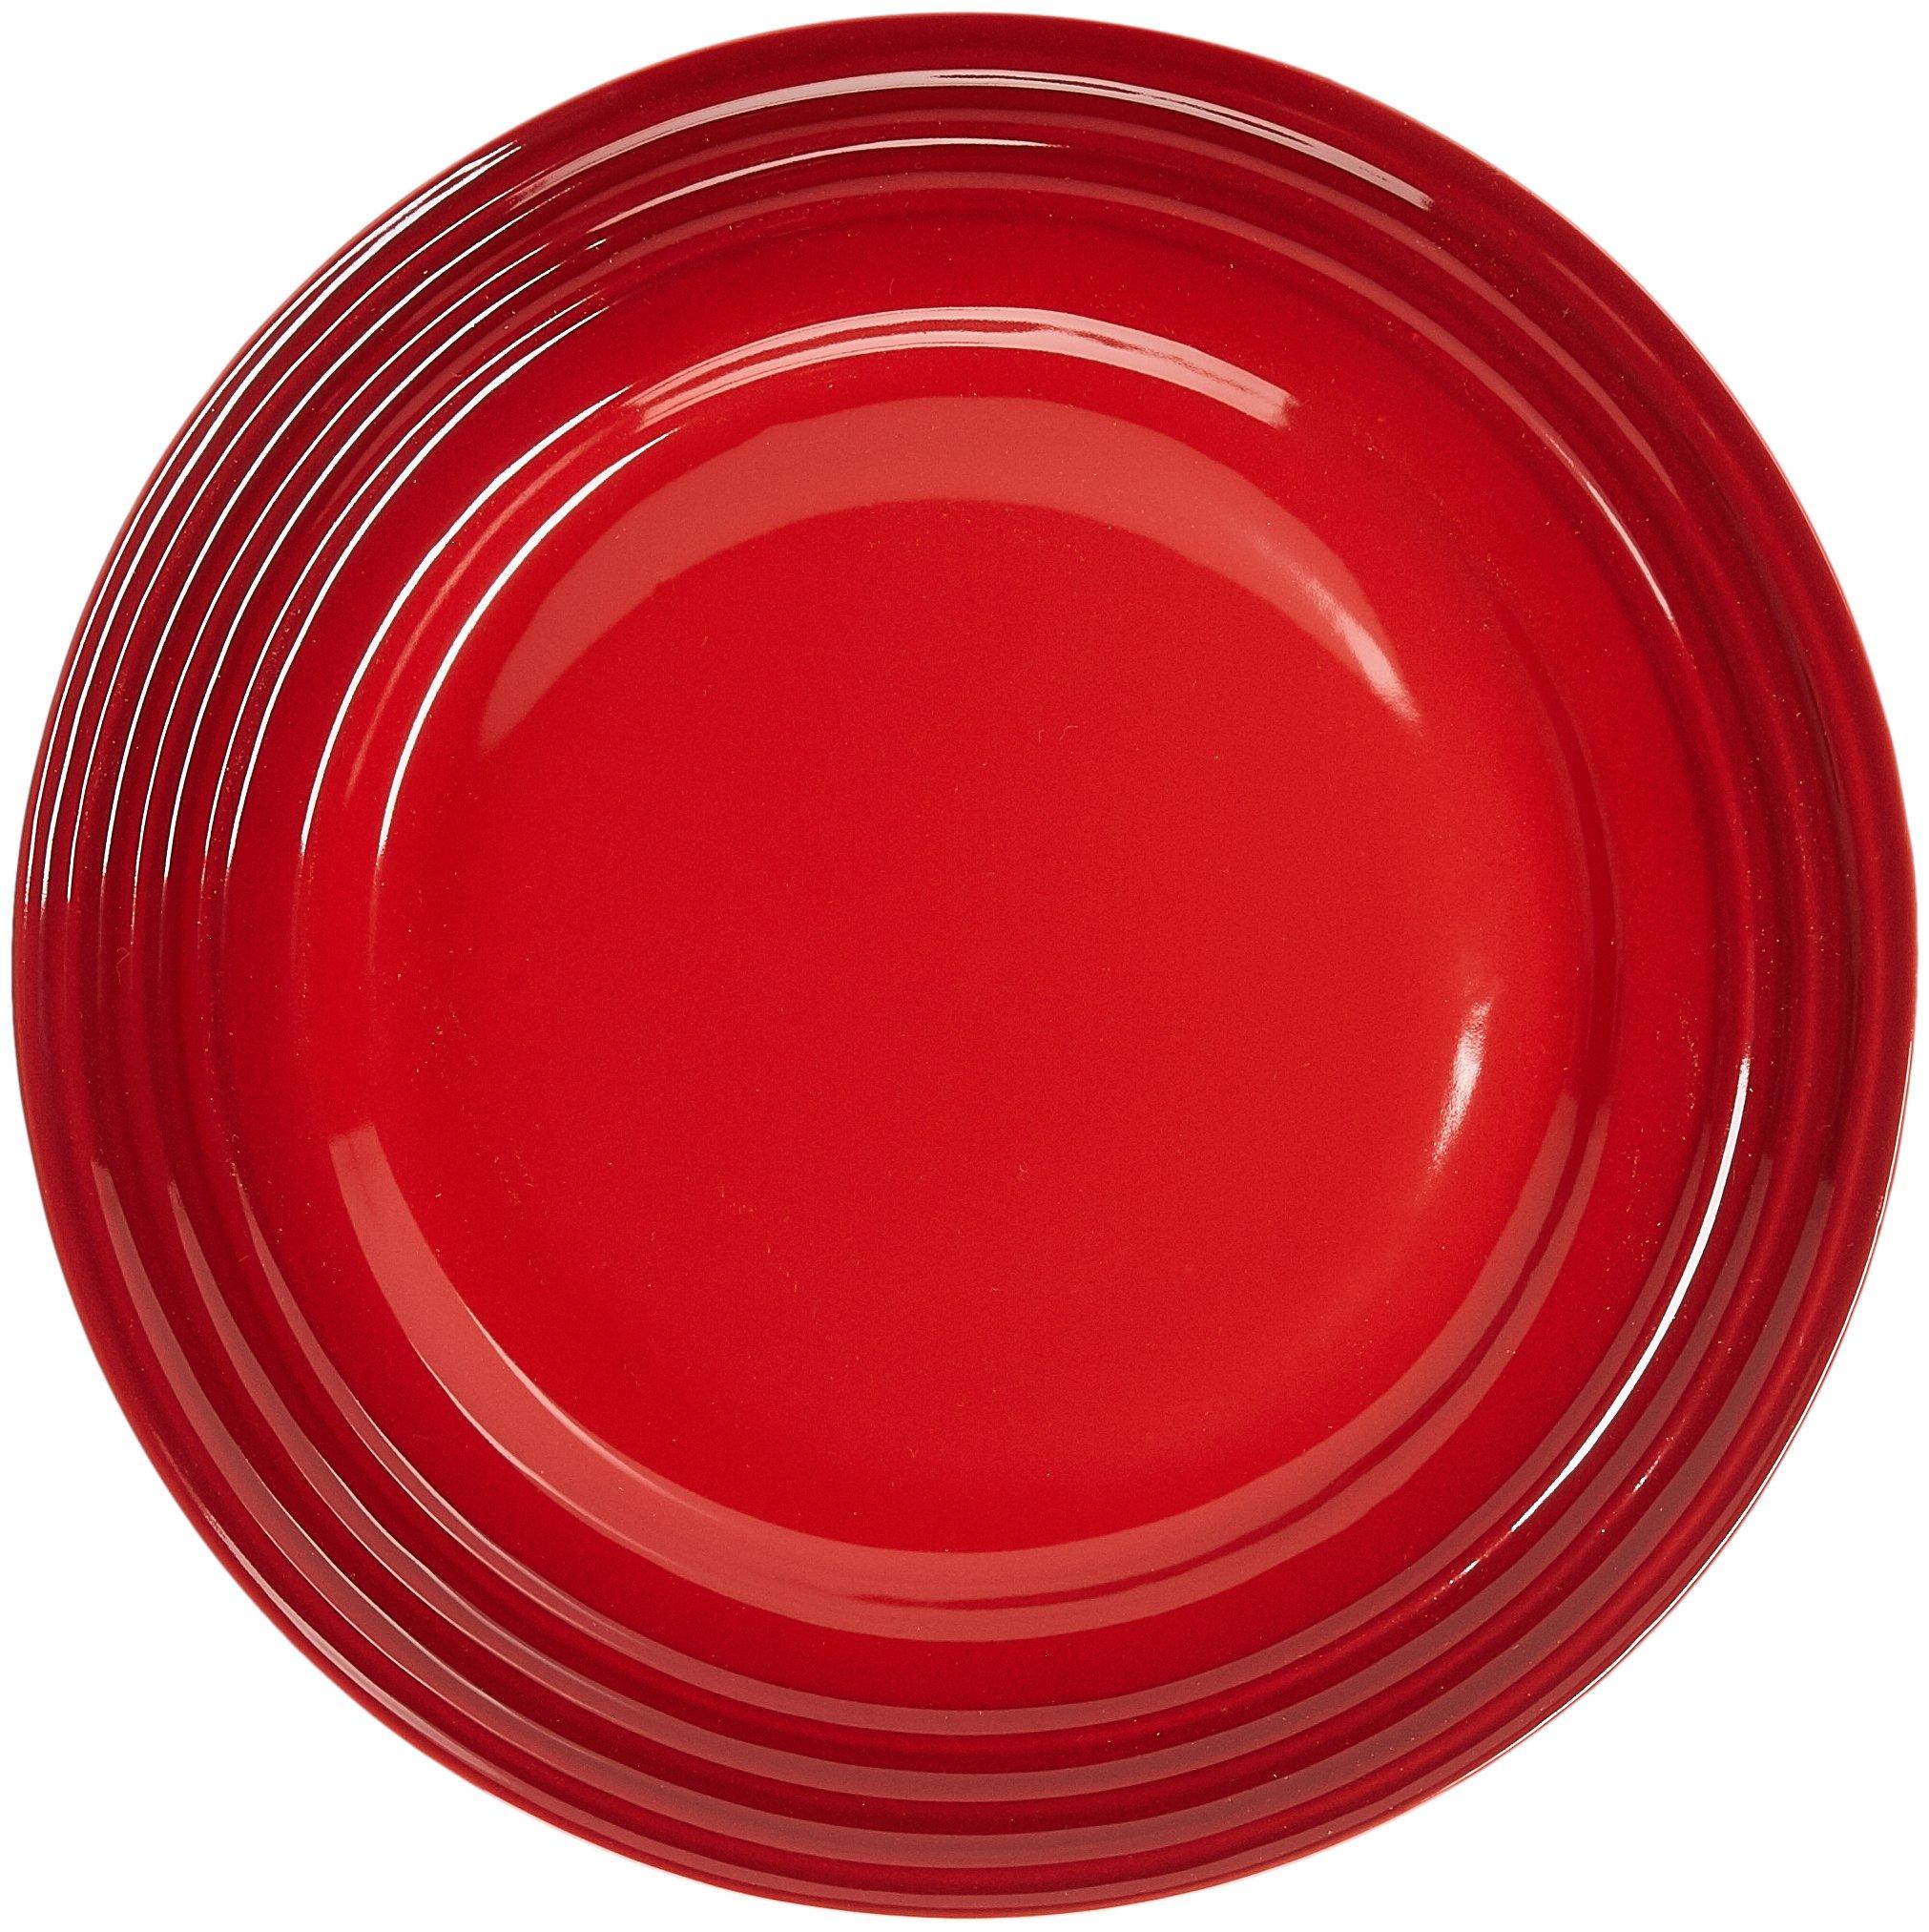 Le Creuset Stoneware 16-Piece Dinnerware Set, Cerise (Cherry Red) by Le Creuset (Image #2)